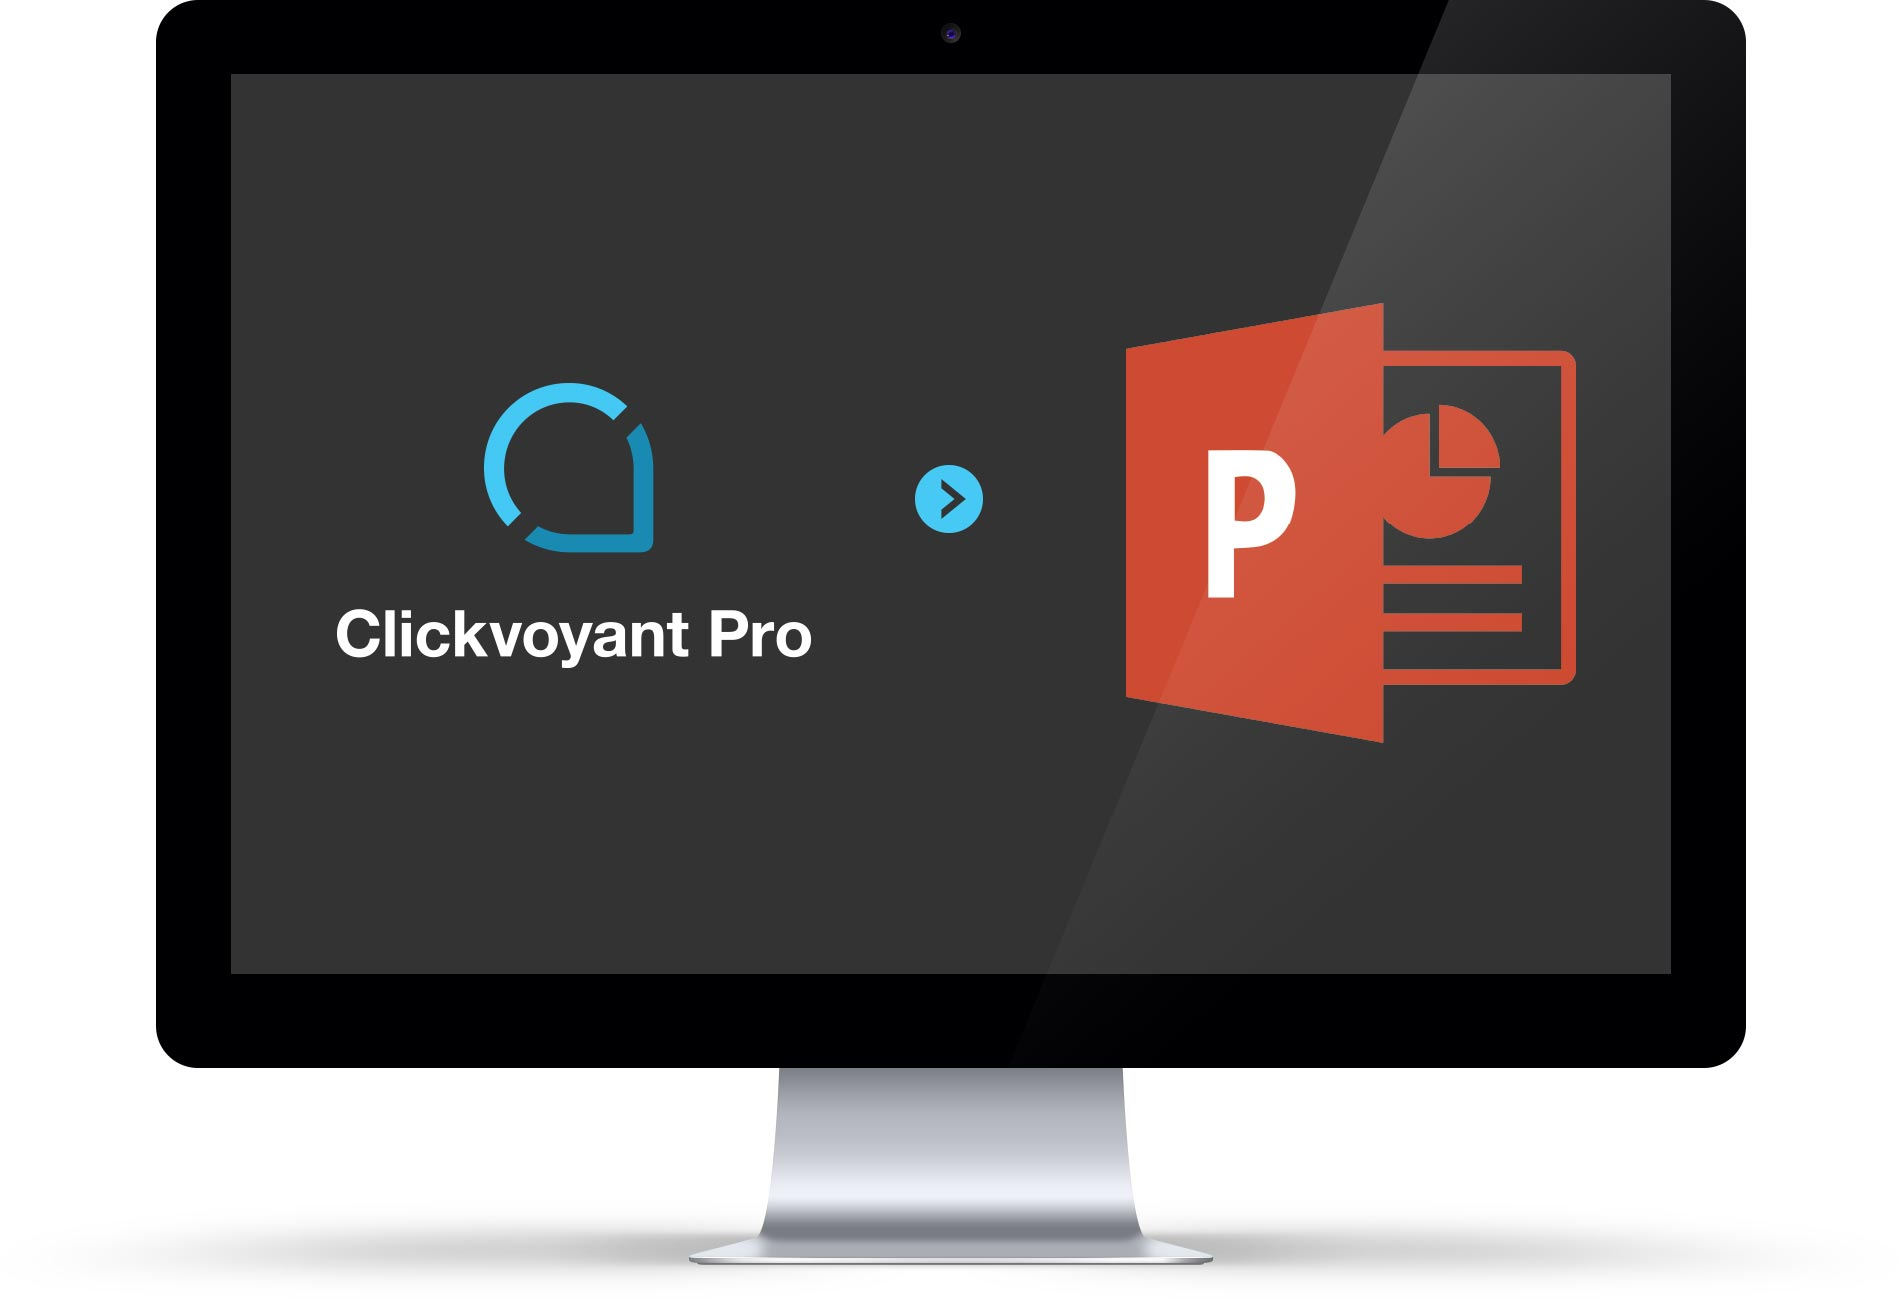 CV-Desktop-2-export2.jpg